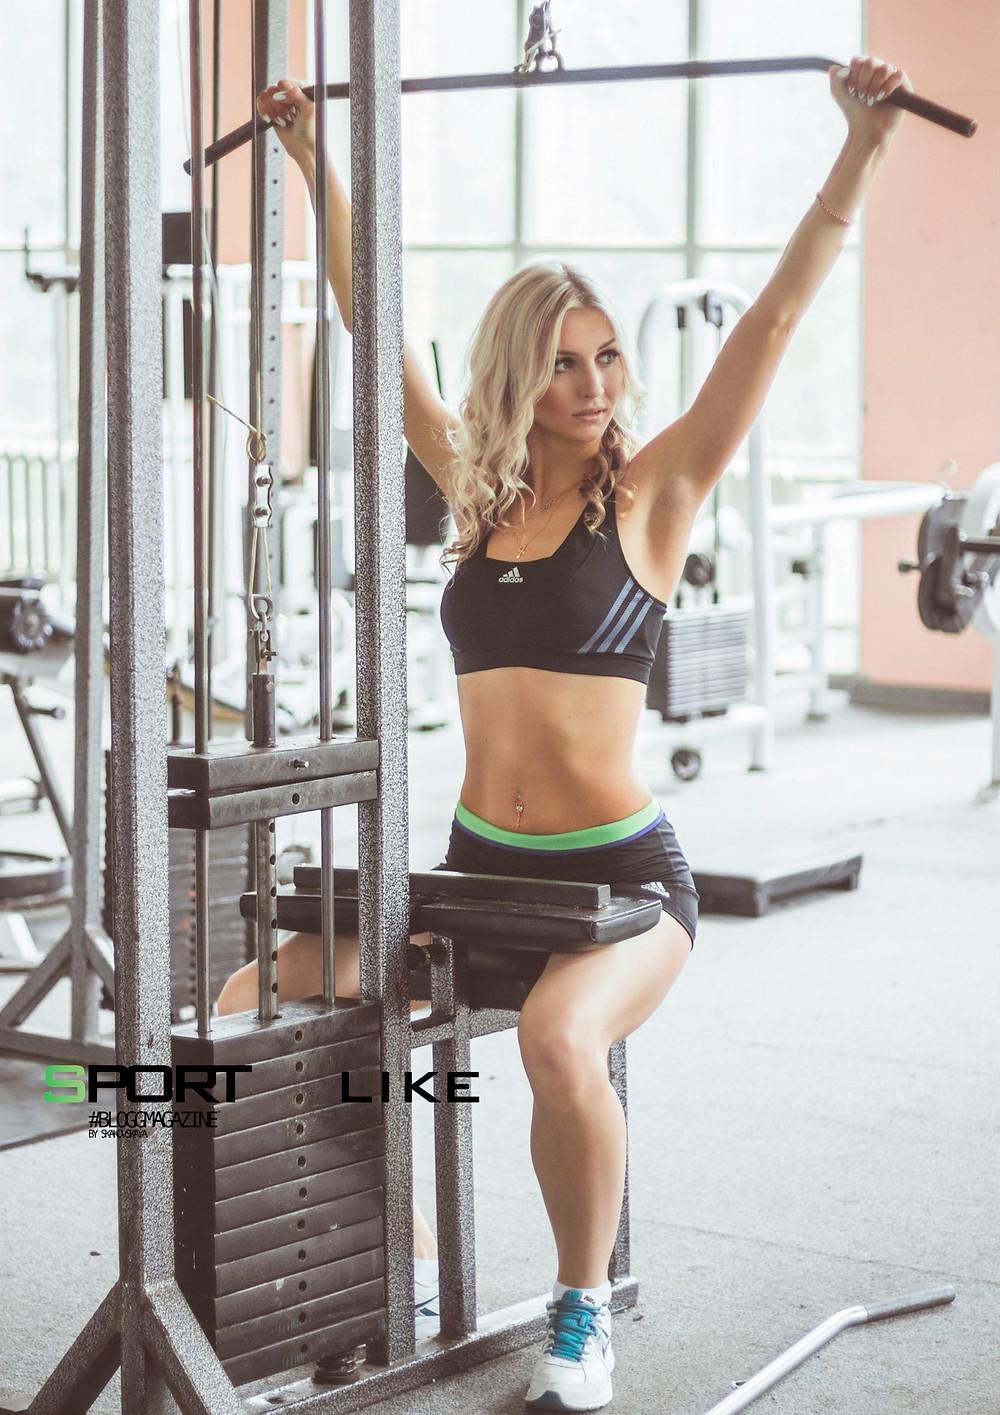 тренер, sport like, bloggmagazine, fitoняшка, спорт, здоровье, красота,skakovskaya, глянцевый журнал